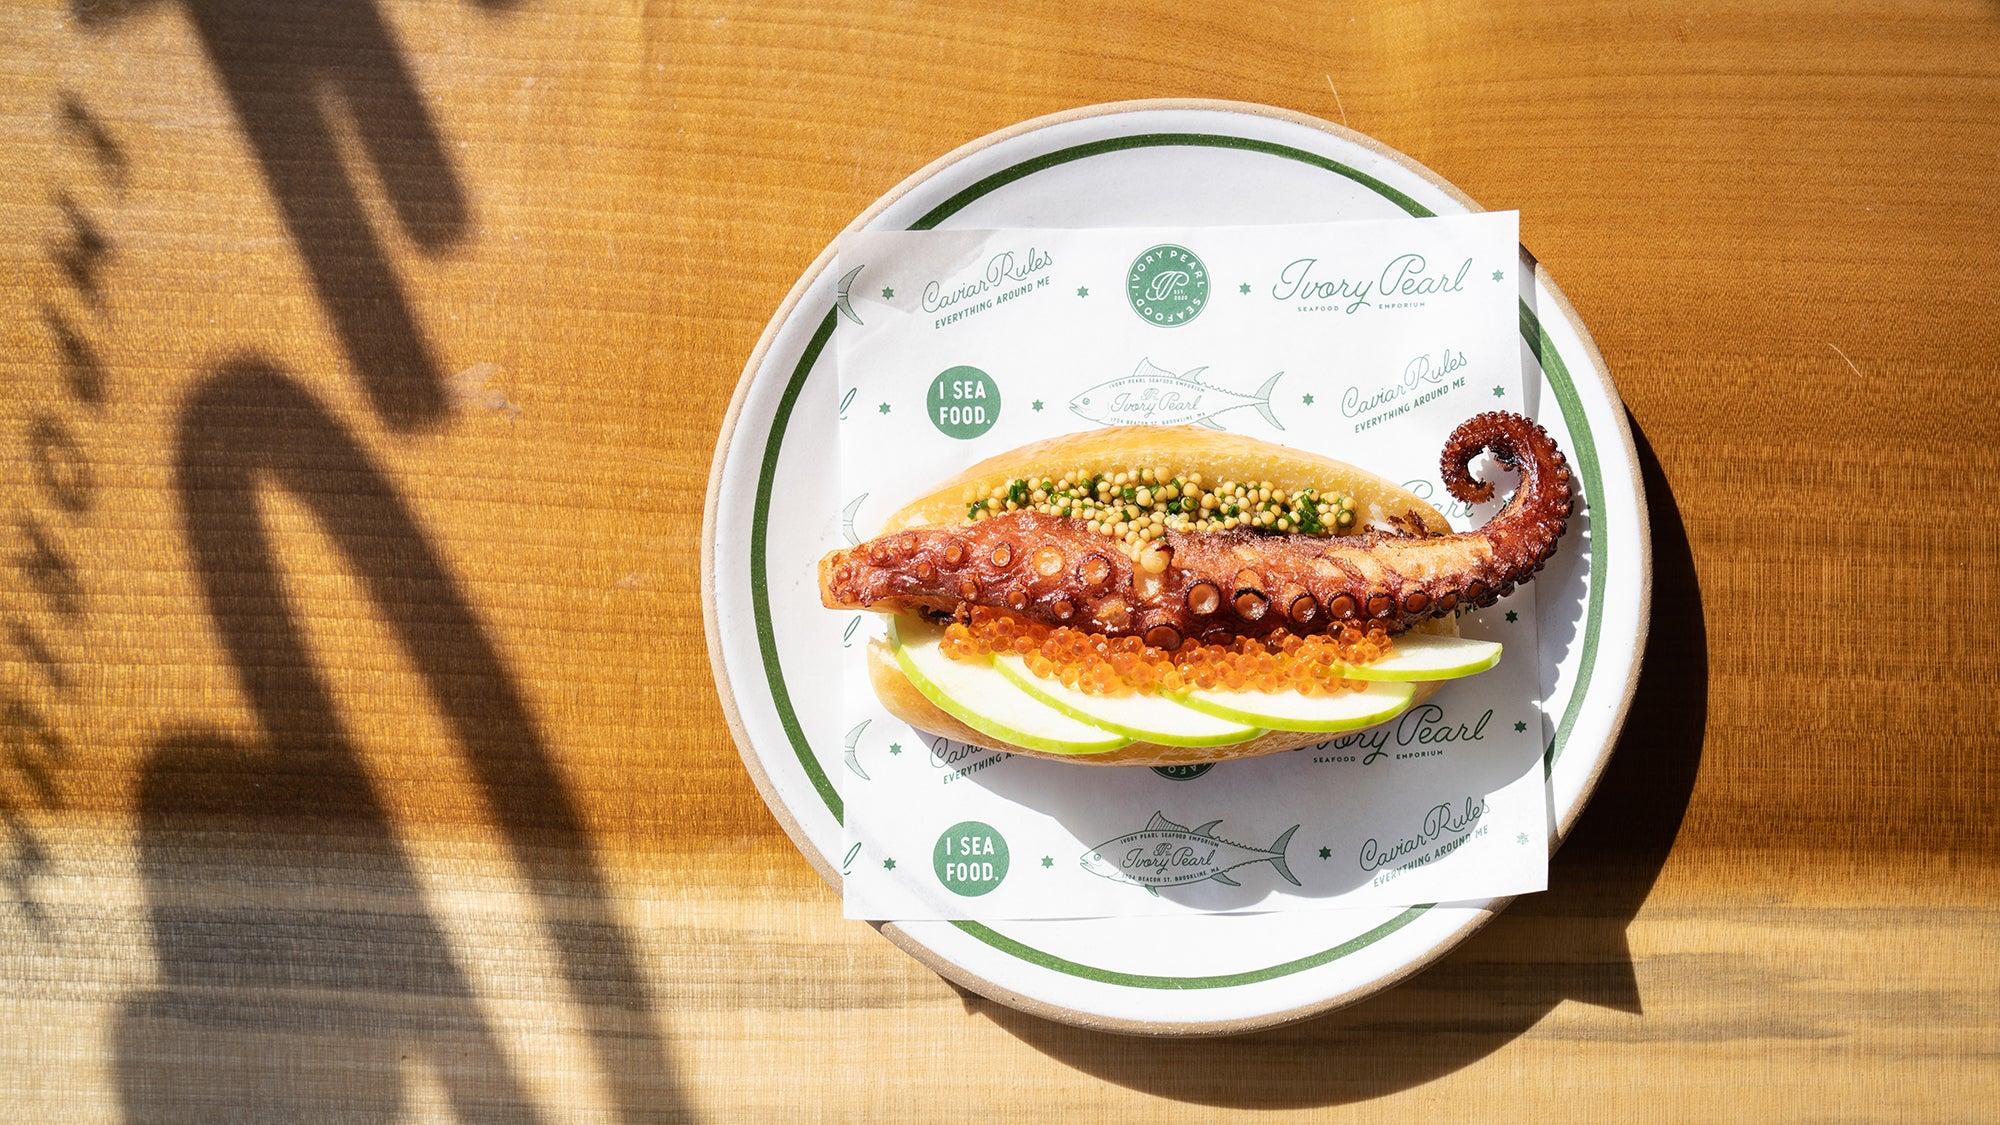 Tentacle hot dog at Ivory Pearl